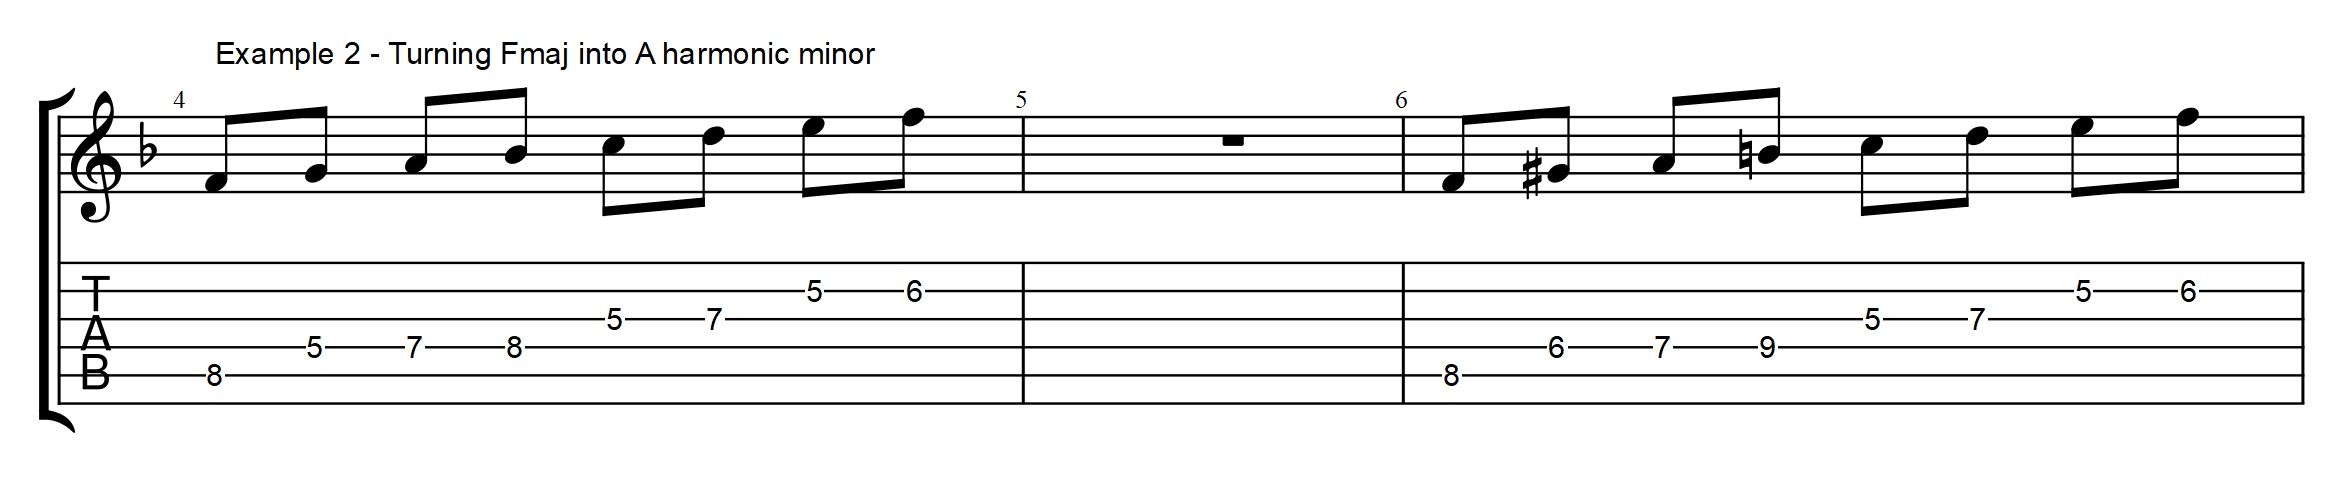 Secret To Play Over Diminished Chords Jens Larsen